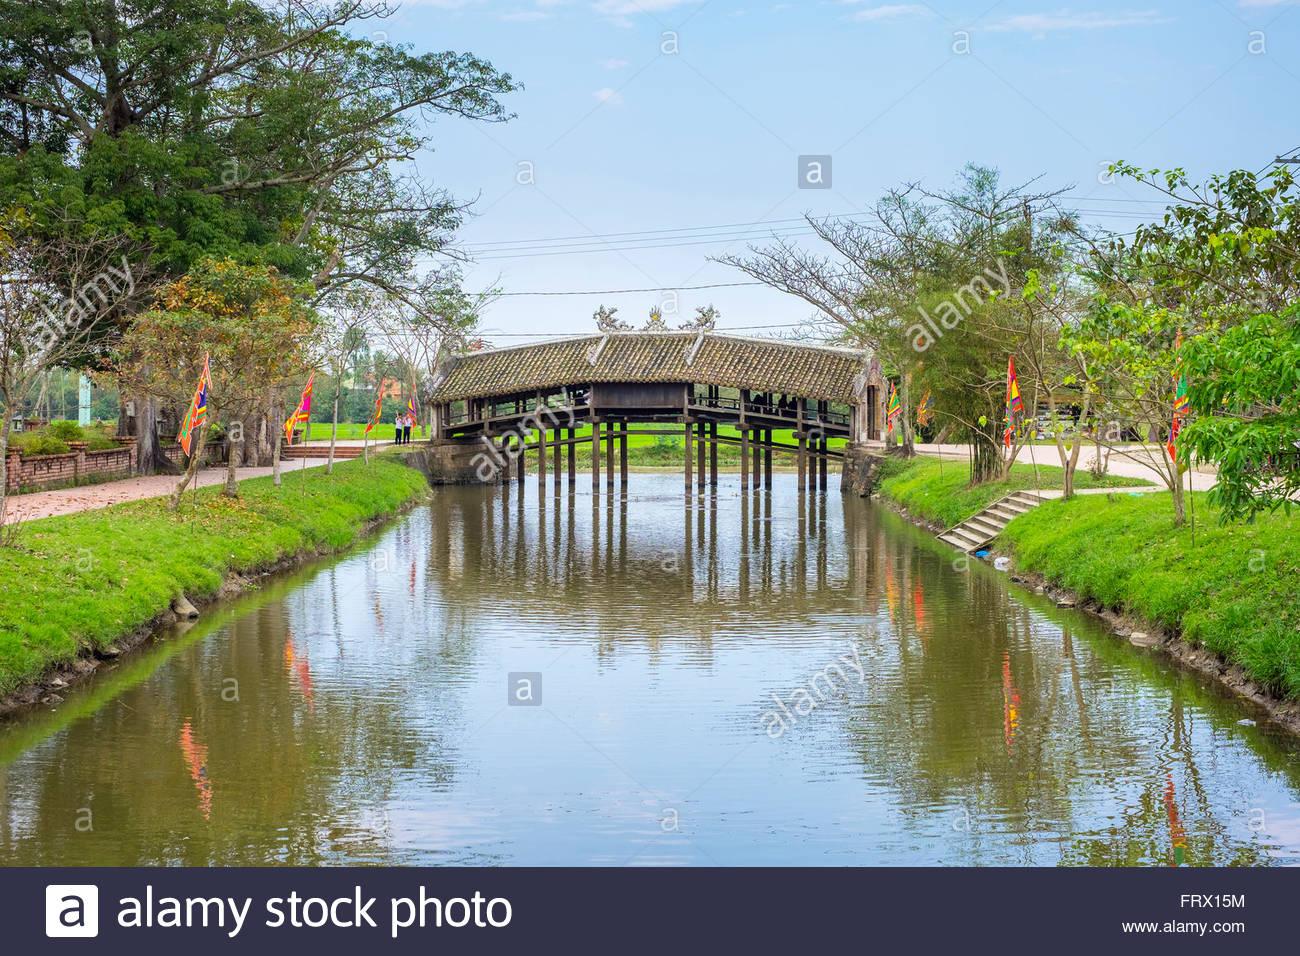 Thanh Toan Brücke, alte japanische Brücke im Dorf Thuy Thanh, Provinz Thua Thien Hue, Vietnam Stockbild